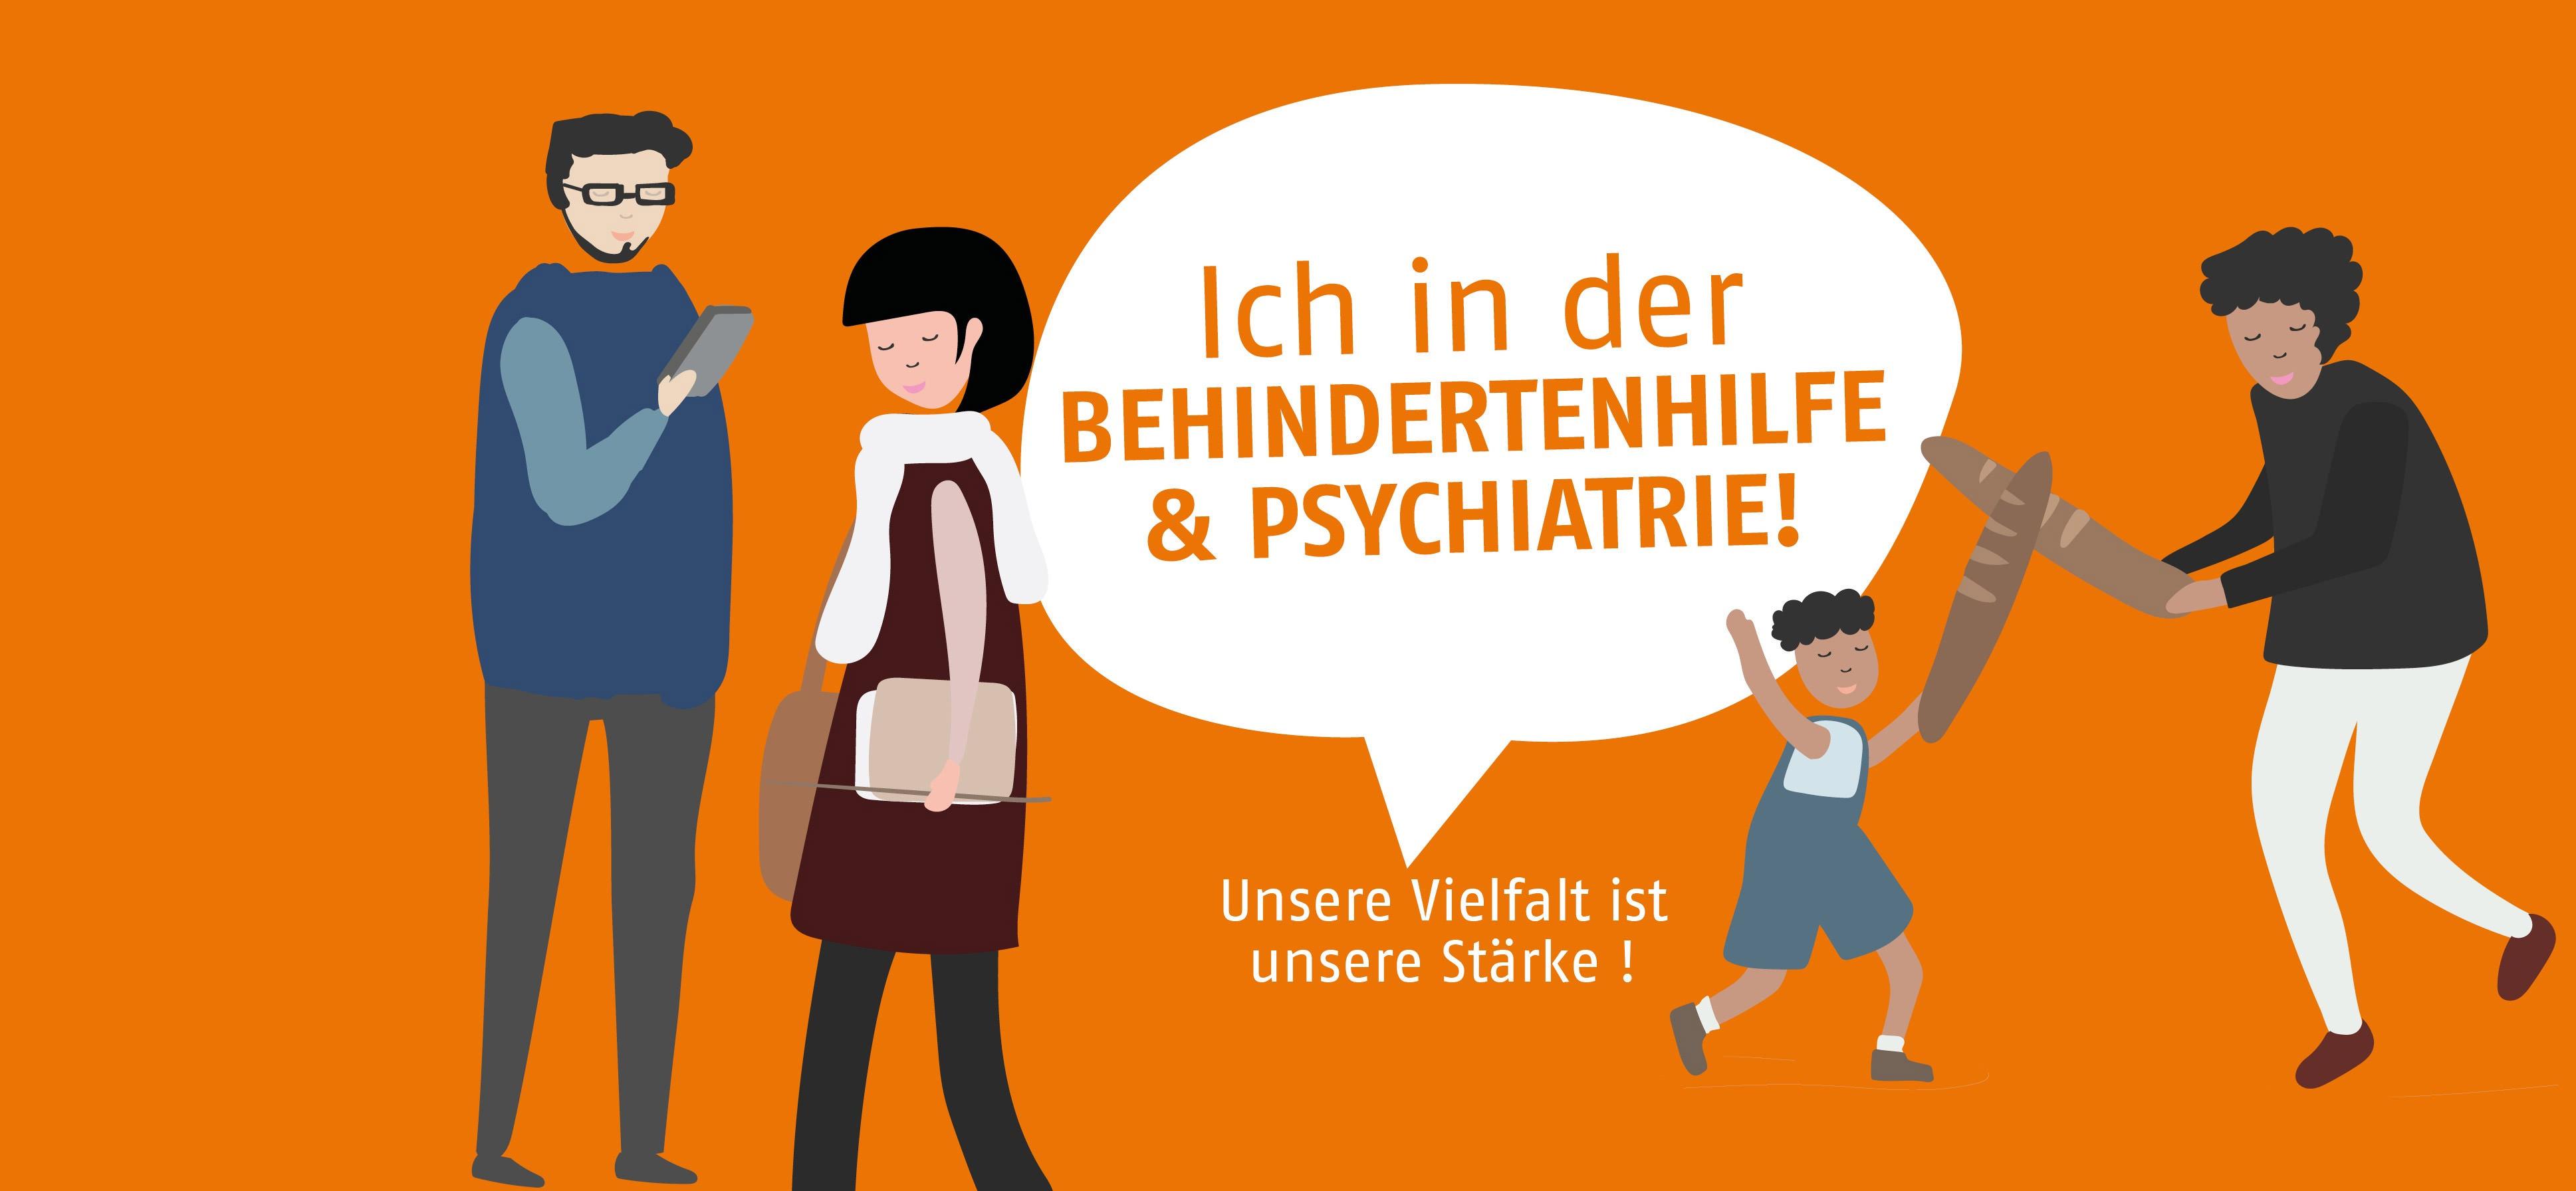 AWO Bezirksverband Ober- und Mittelfranken e. V. - Behindertenhilfe & Psychatrie